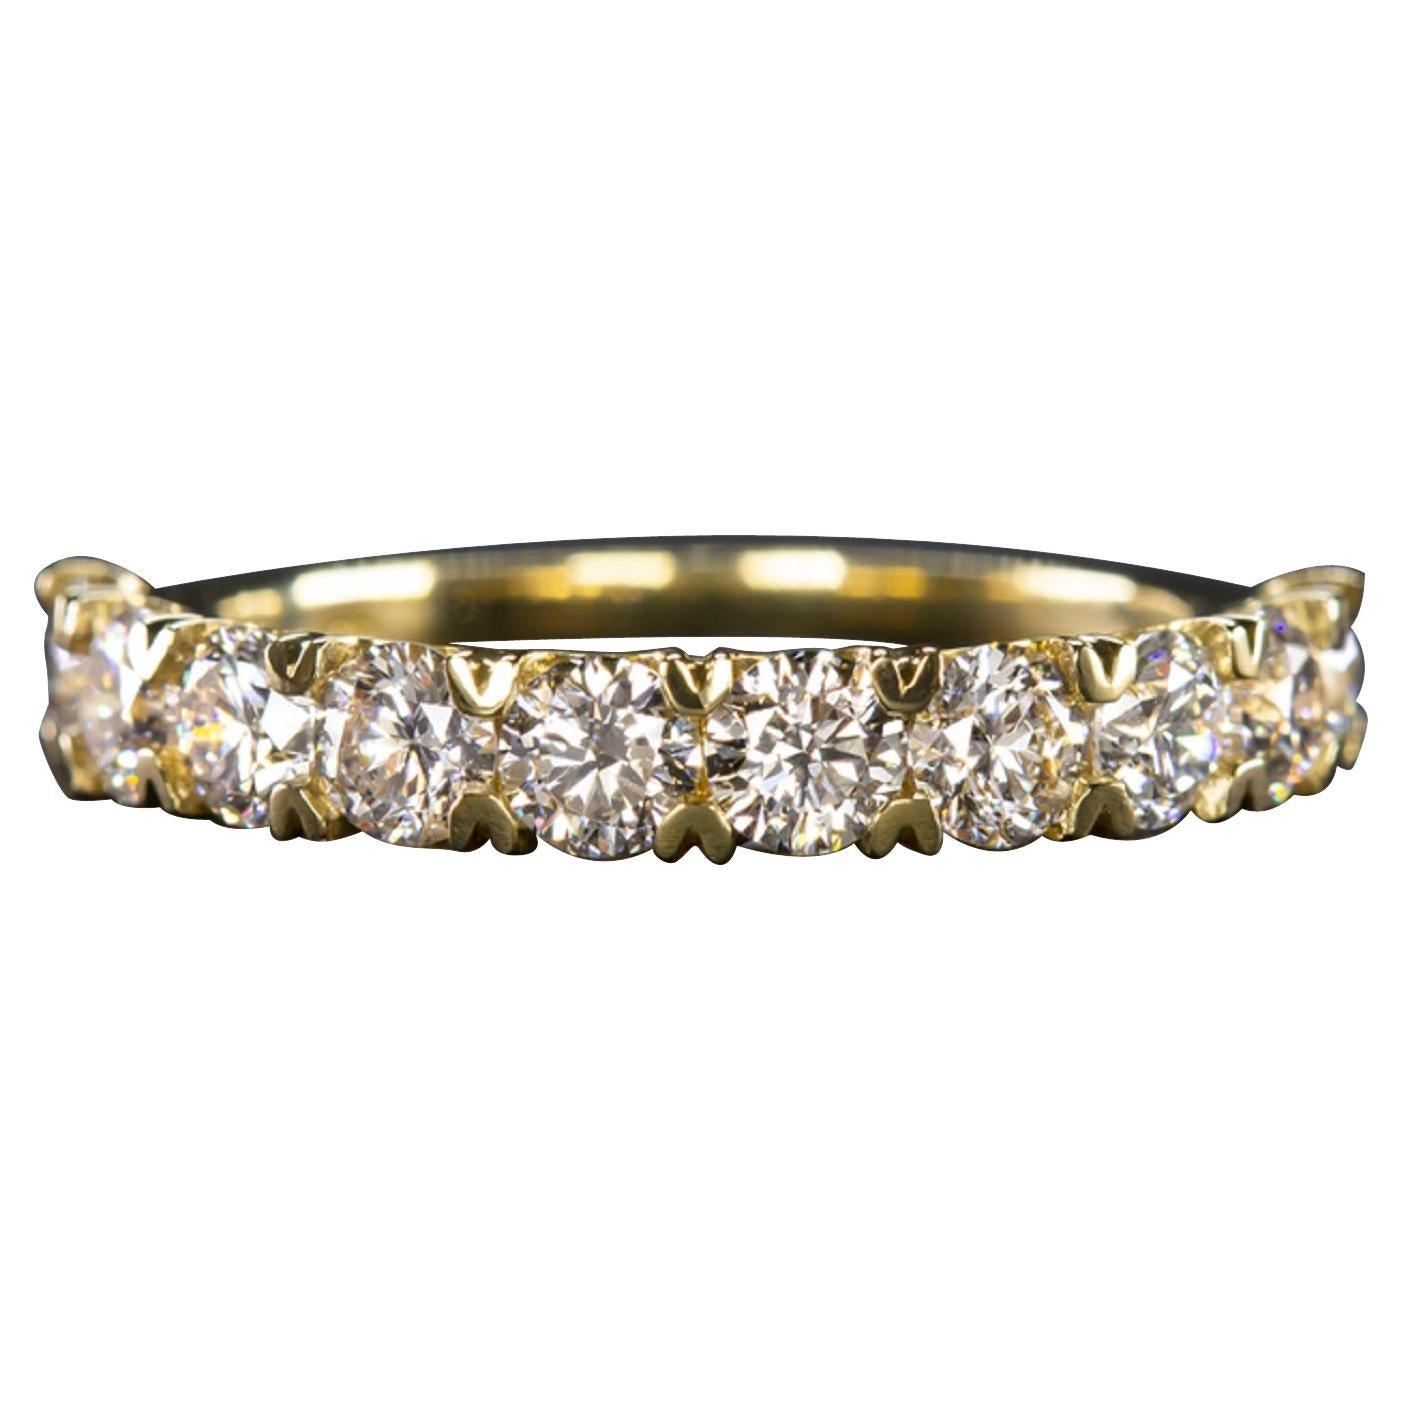 1.50 Carat Round Brilliant Cut Diamond Band Ring 18 Carat Yellow Gold